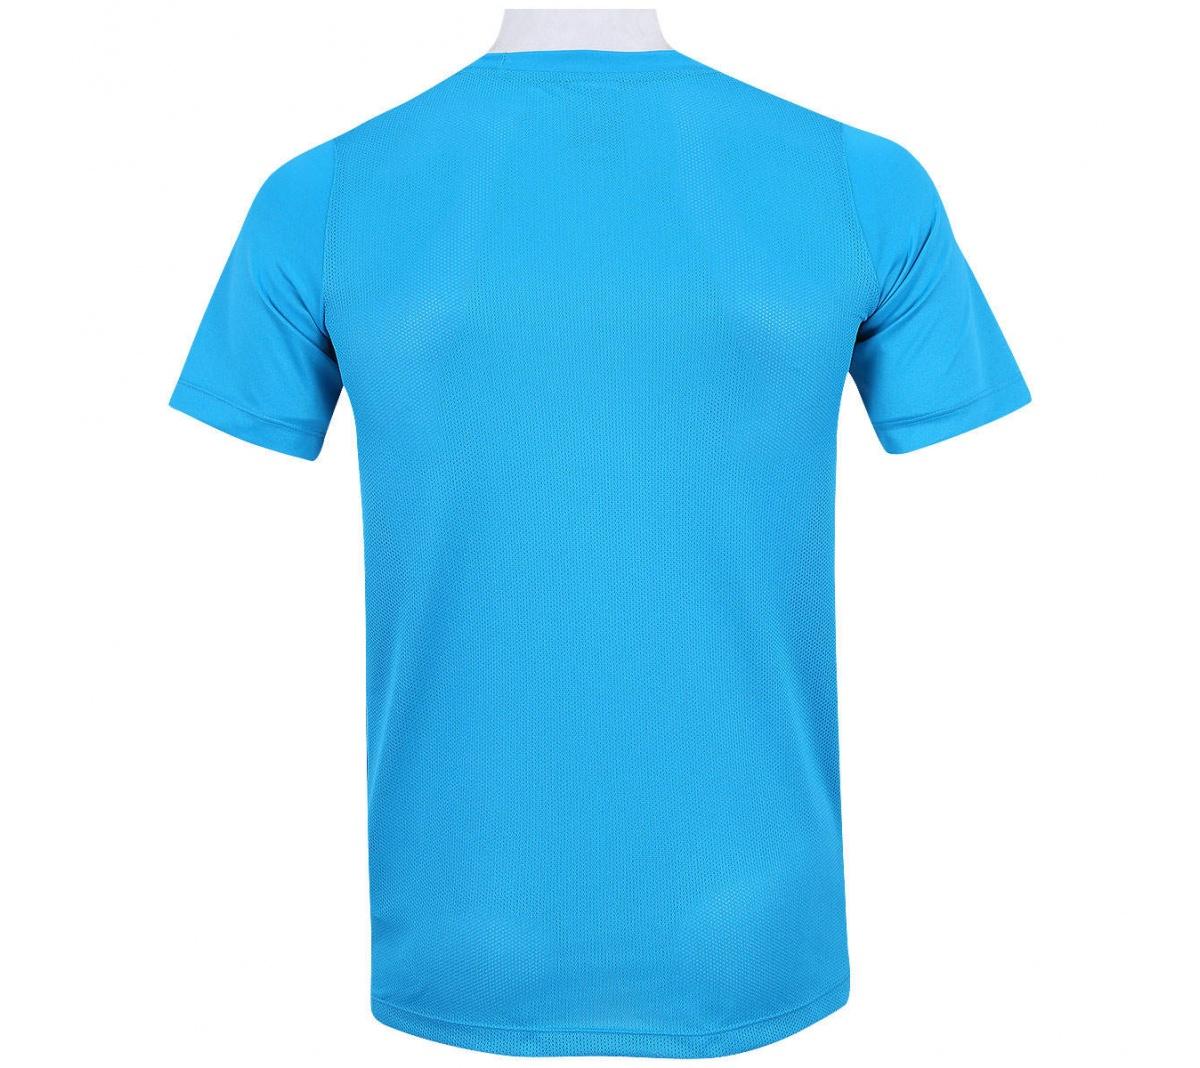 Camisa Nike Academy SS Training - Mundo do Futebol d5227cc33aea4